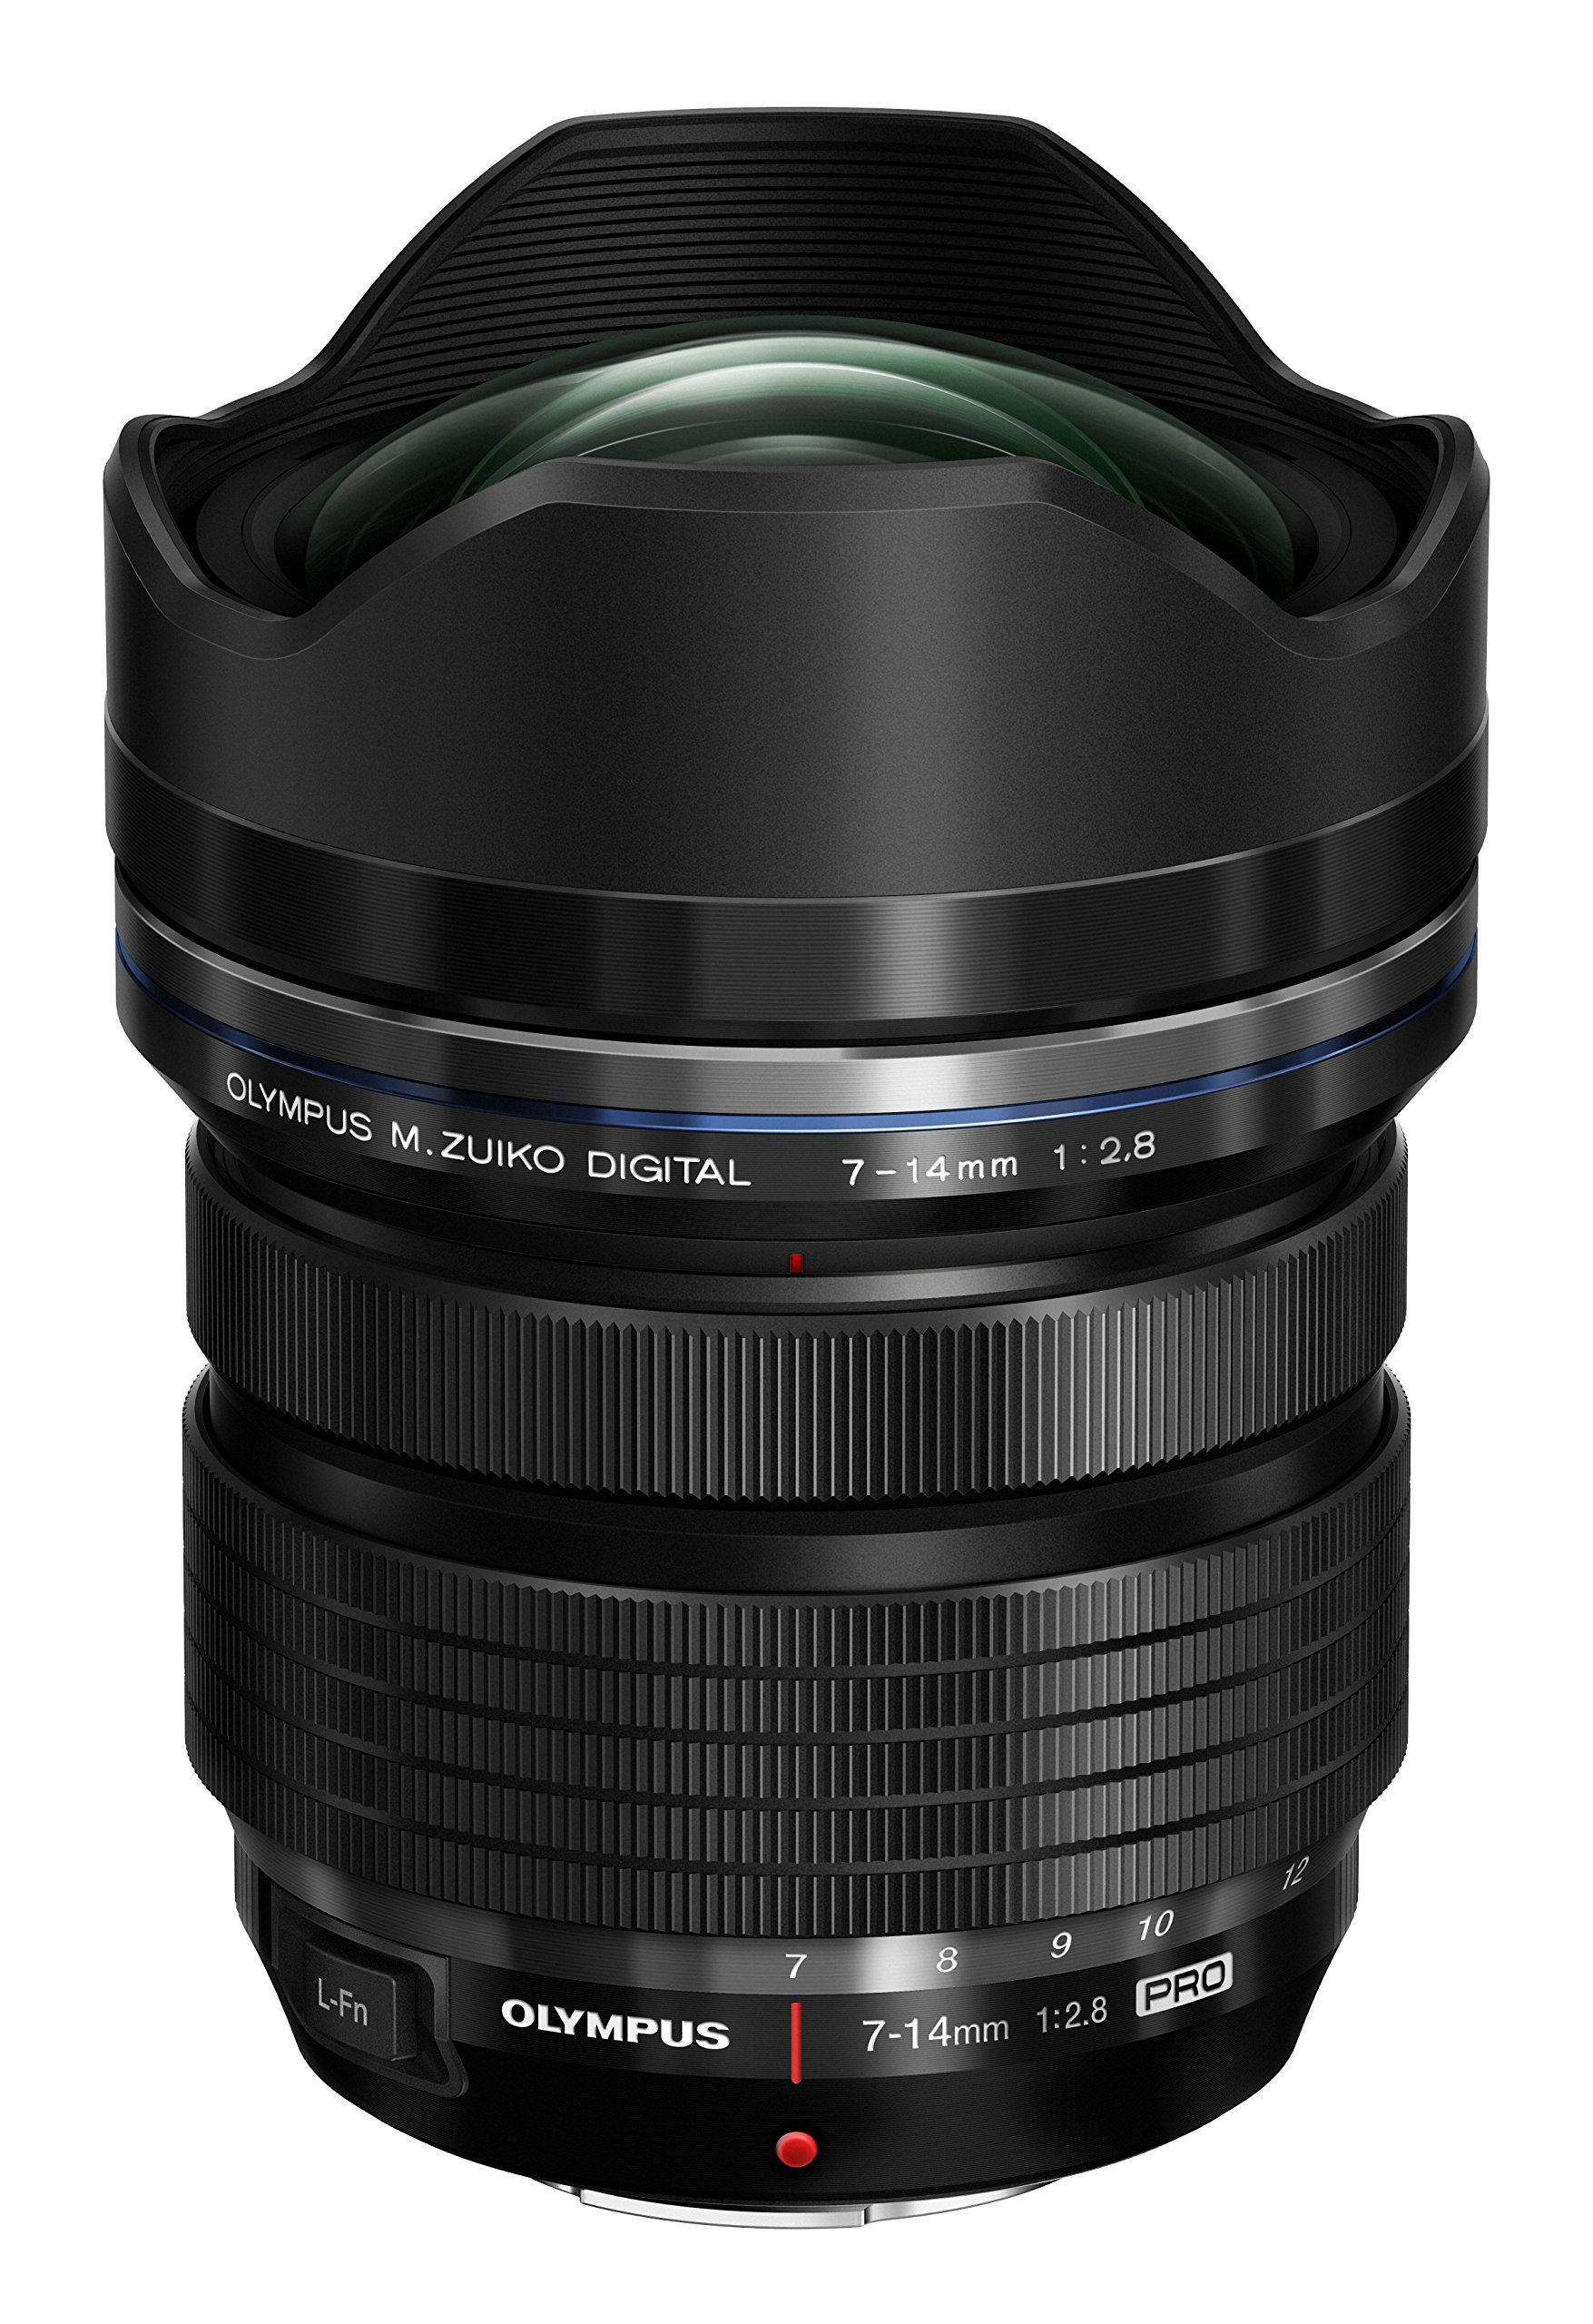 Olympus M.Zuiko Digital ED 7-14mm f/2.8 PRO Lens for Micro Four Thirds Cameras by Olympus